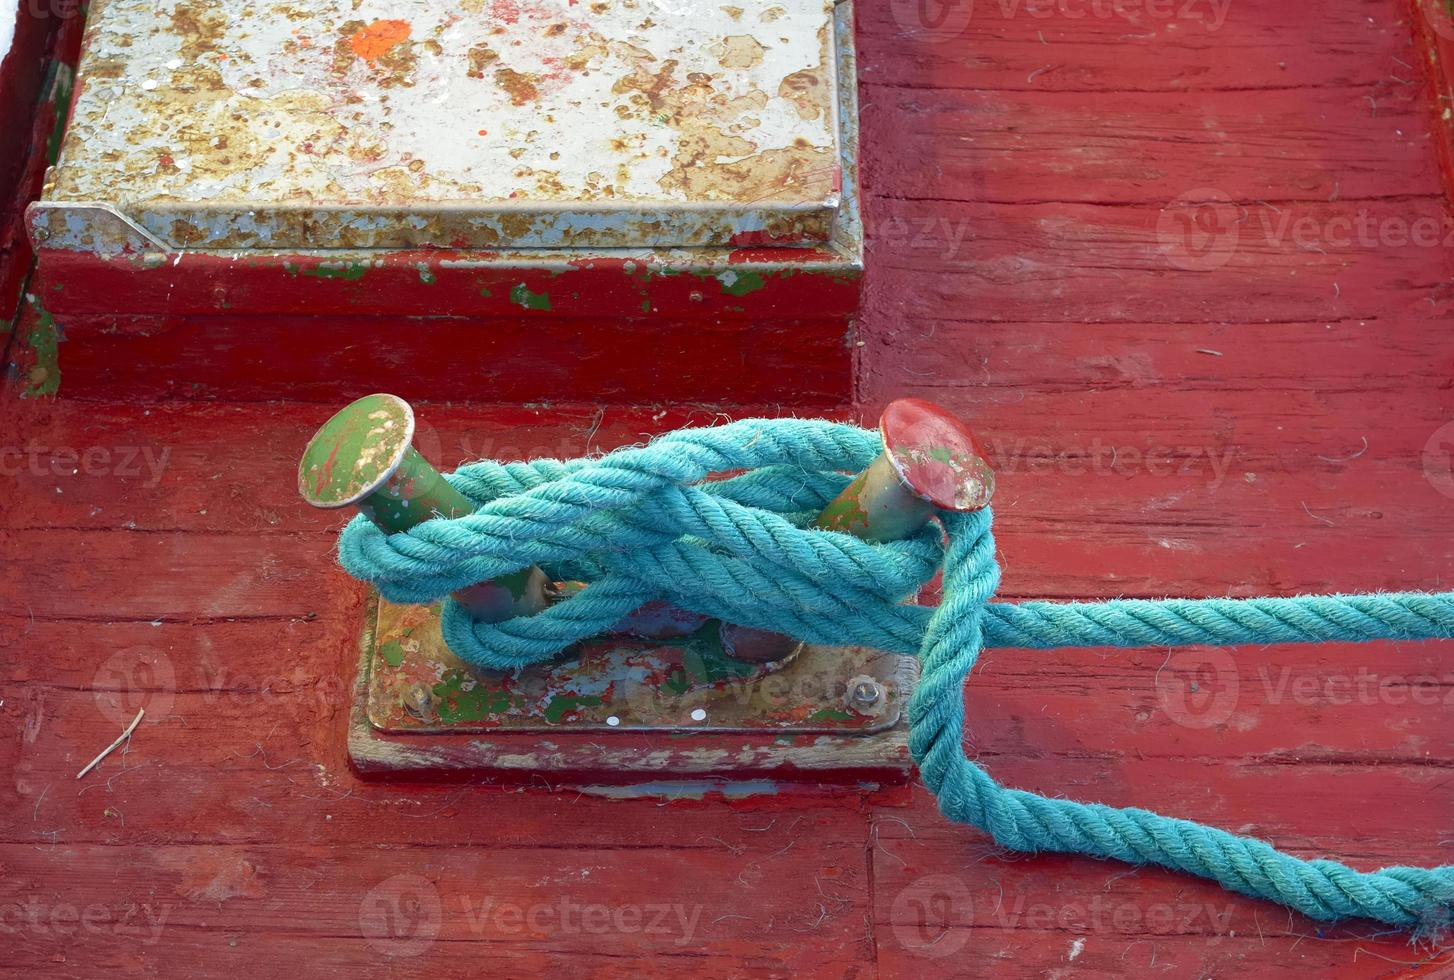 Primer plano del nodo de amarre sobre la plataforma de madera de un barco foto